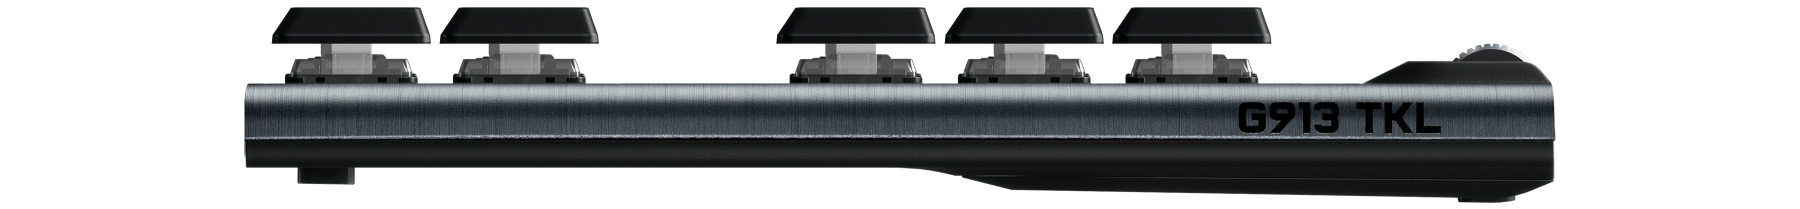 G915 | 優質材料